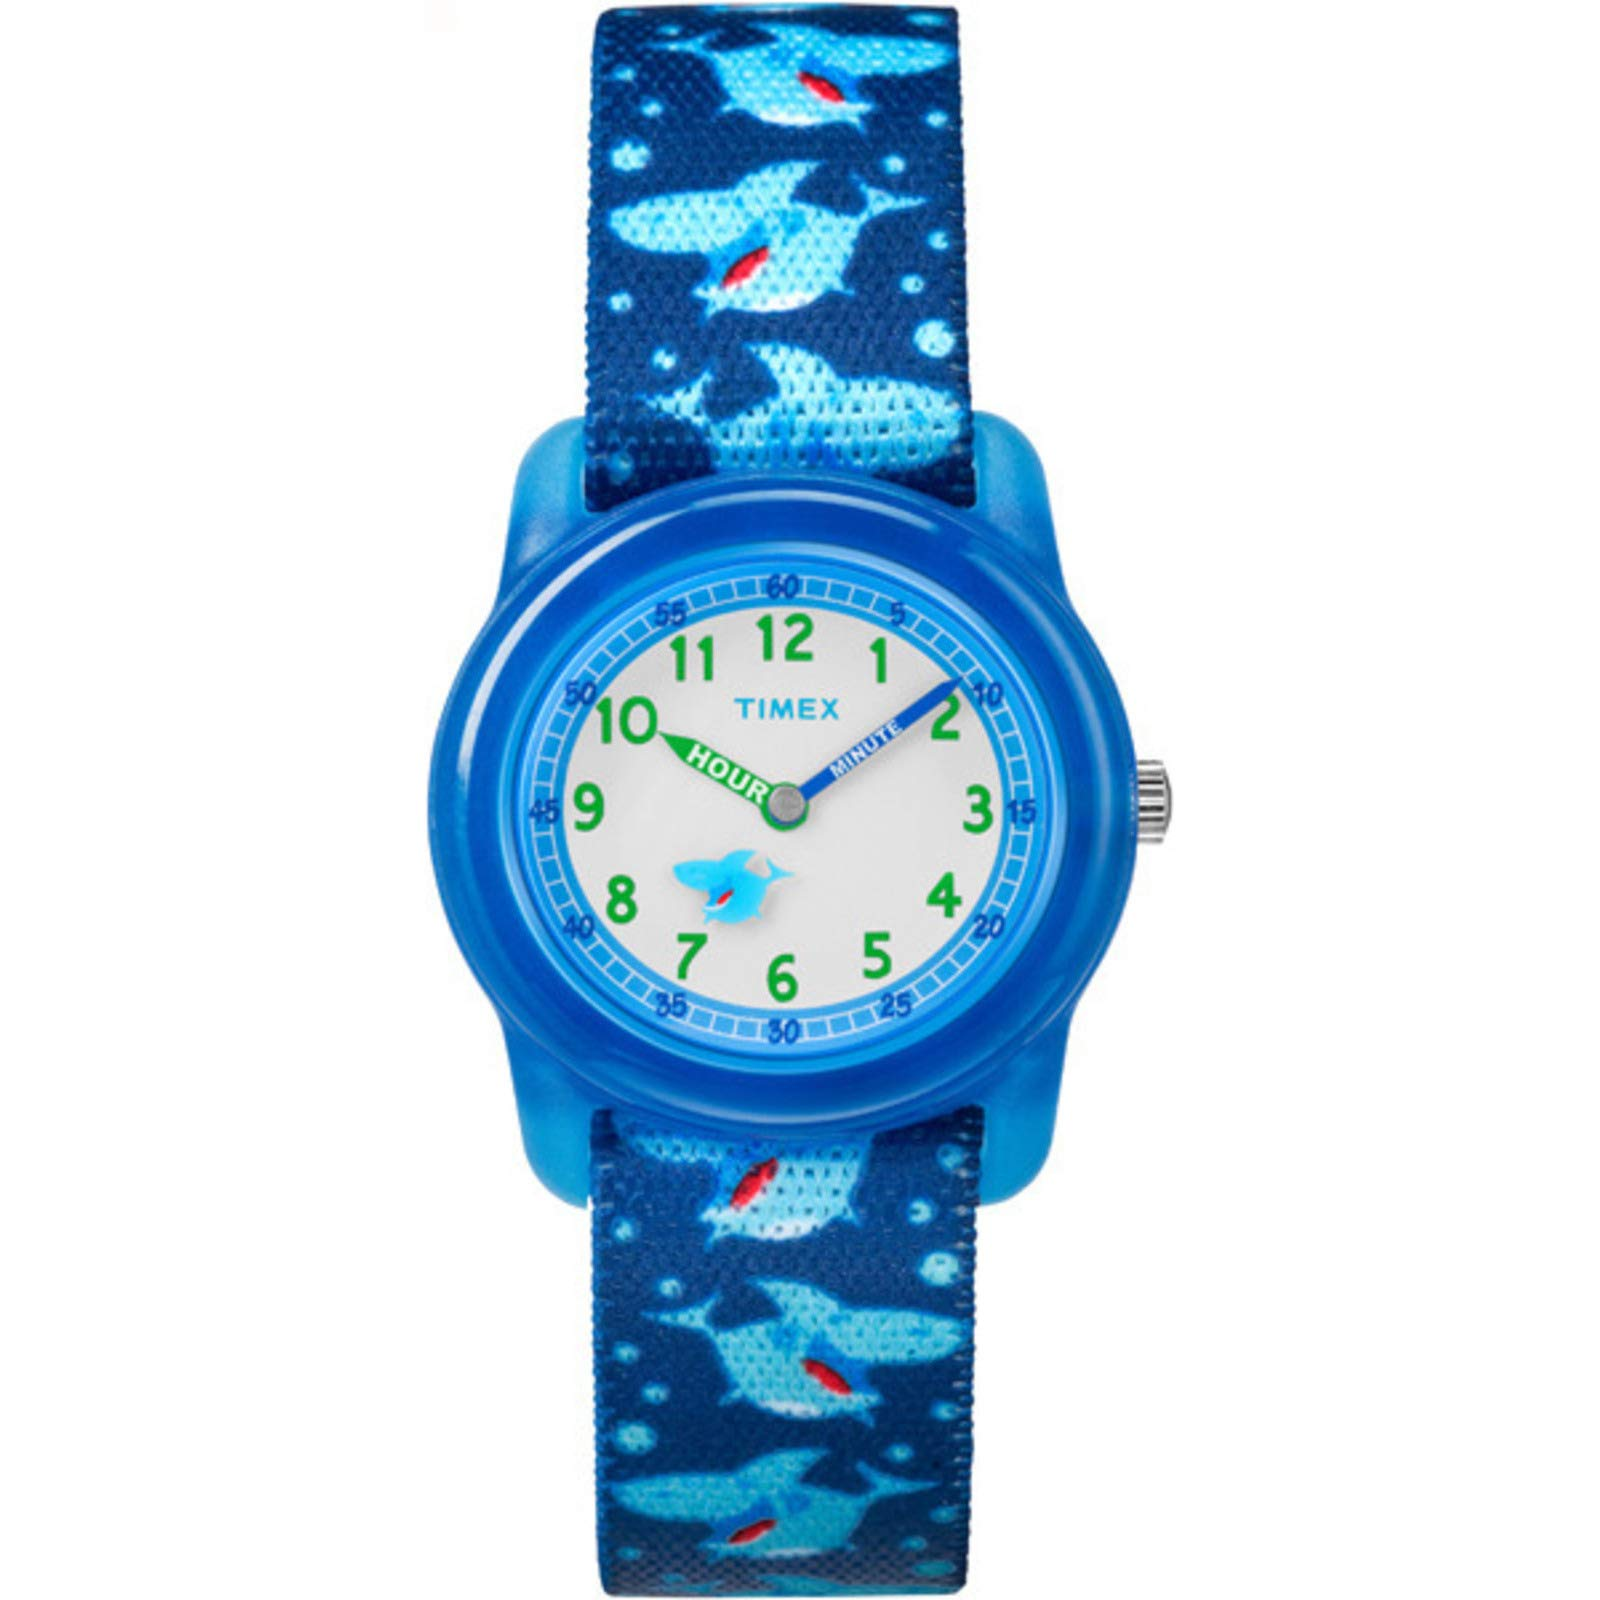 Timex Youth Kids Analog 28mm Elastic Fabric Strap  Blue  Watch TW7C13500 by Timex